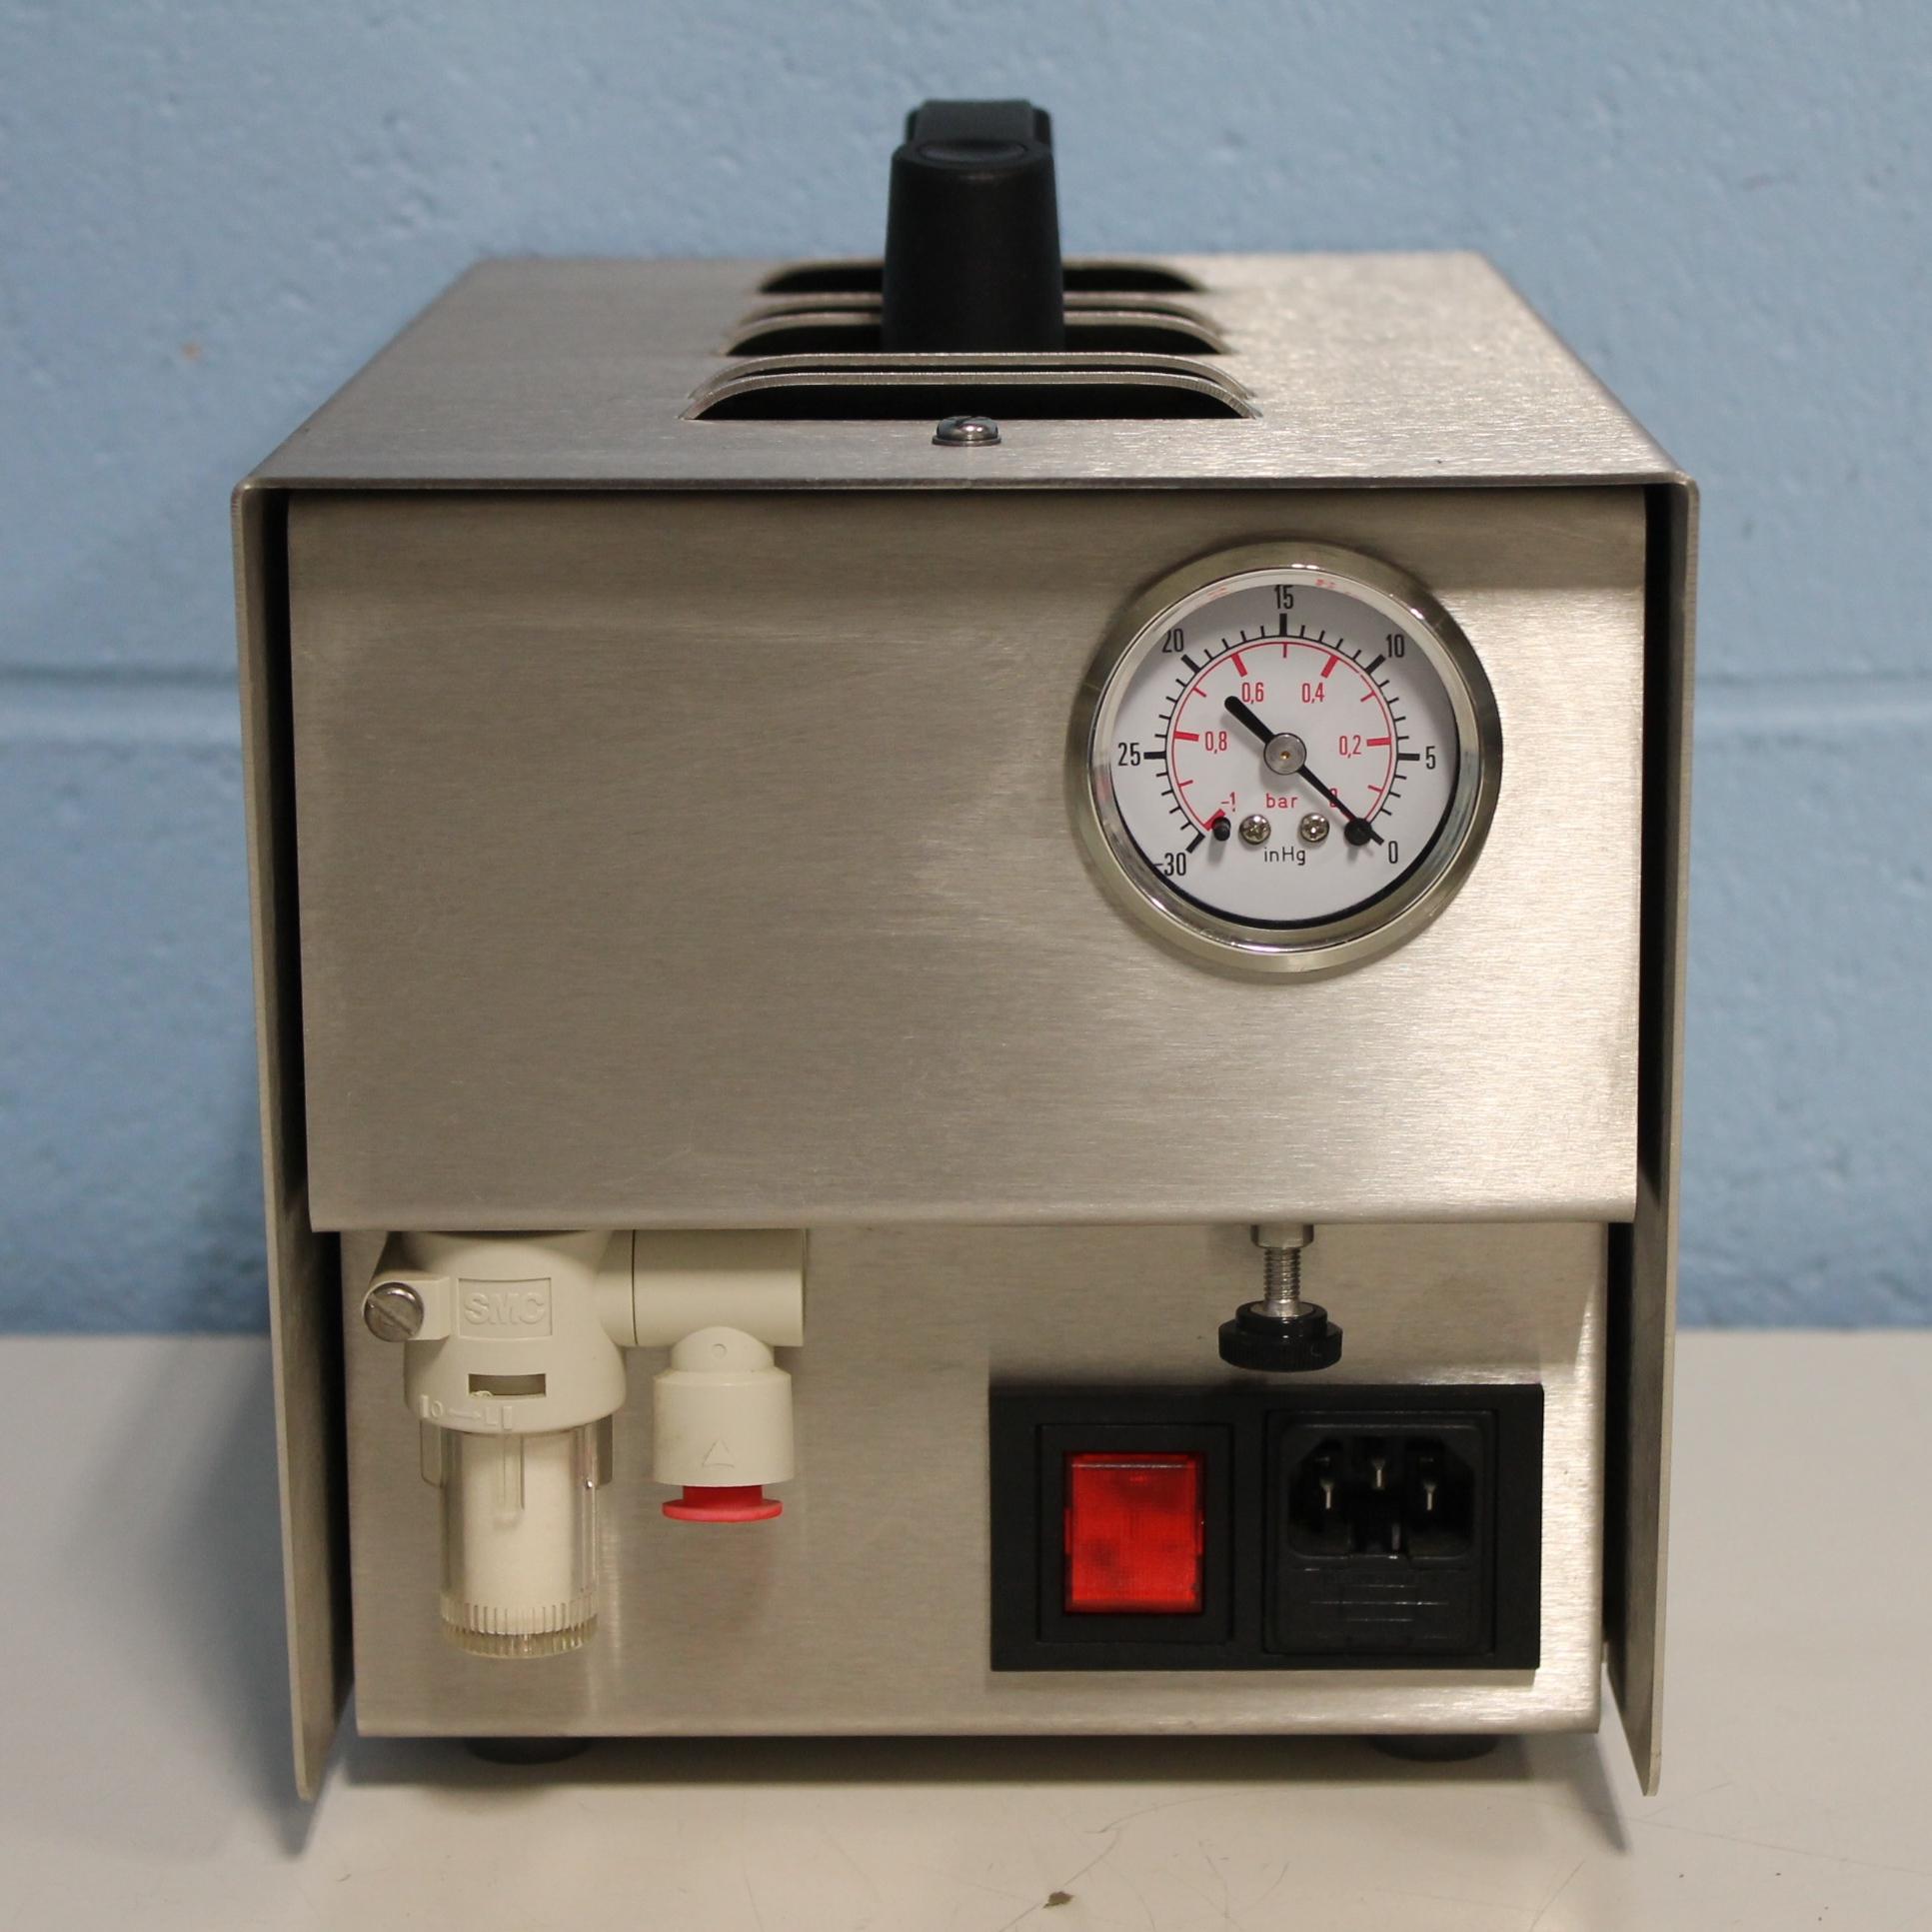 Refurbished Polaris Instruments Small Vacuum Pump